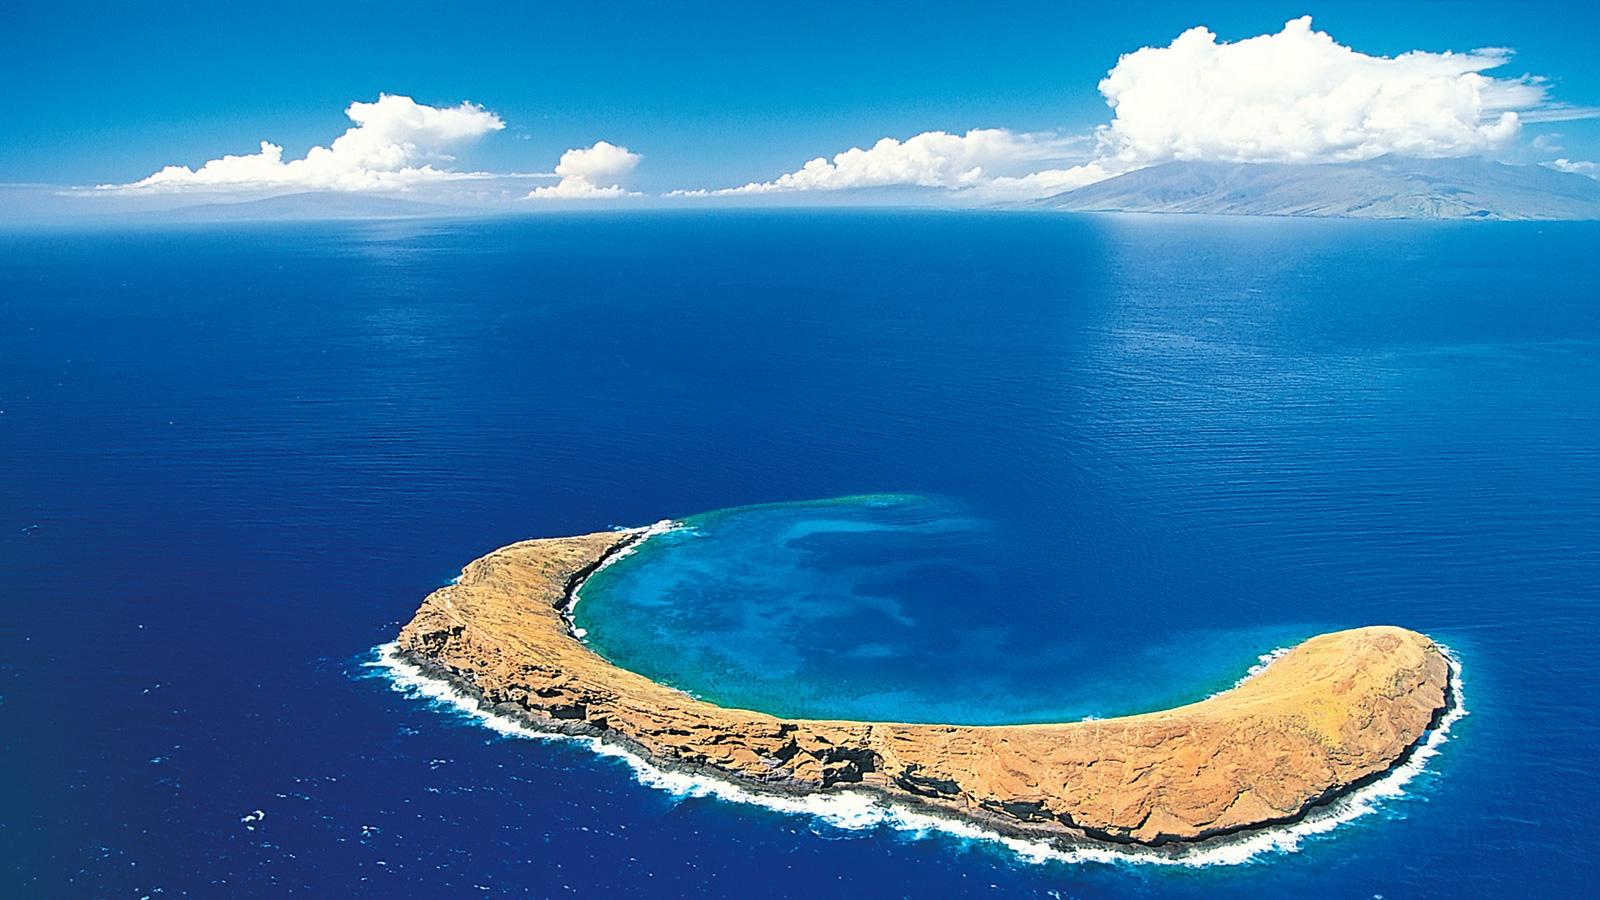 Beautiful Island   1600x900   169 1600x900